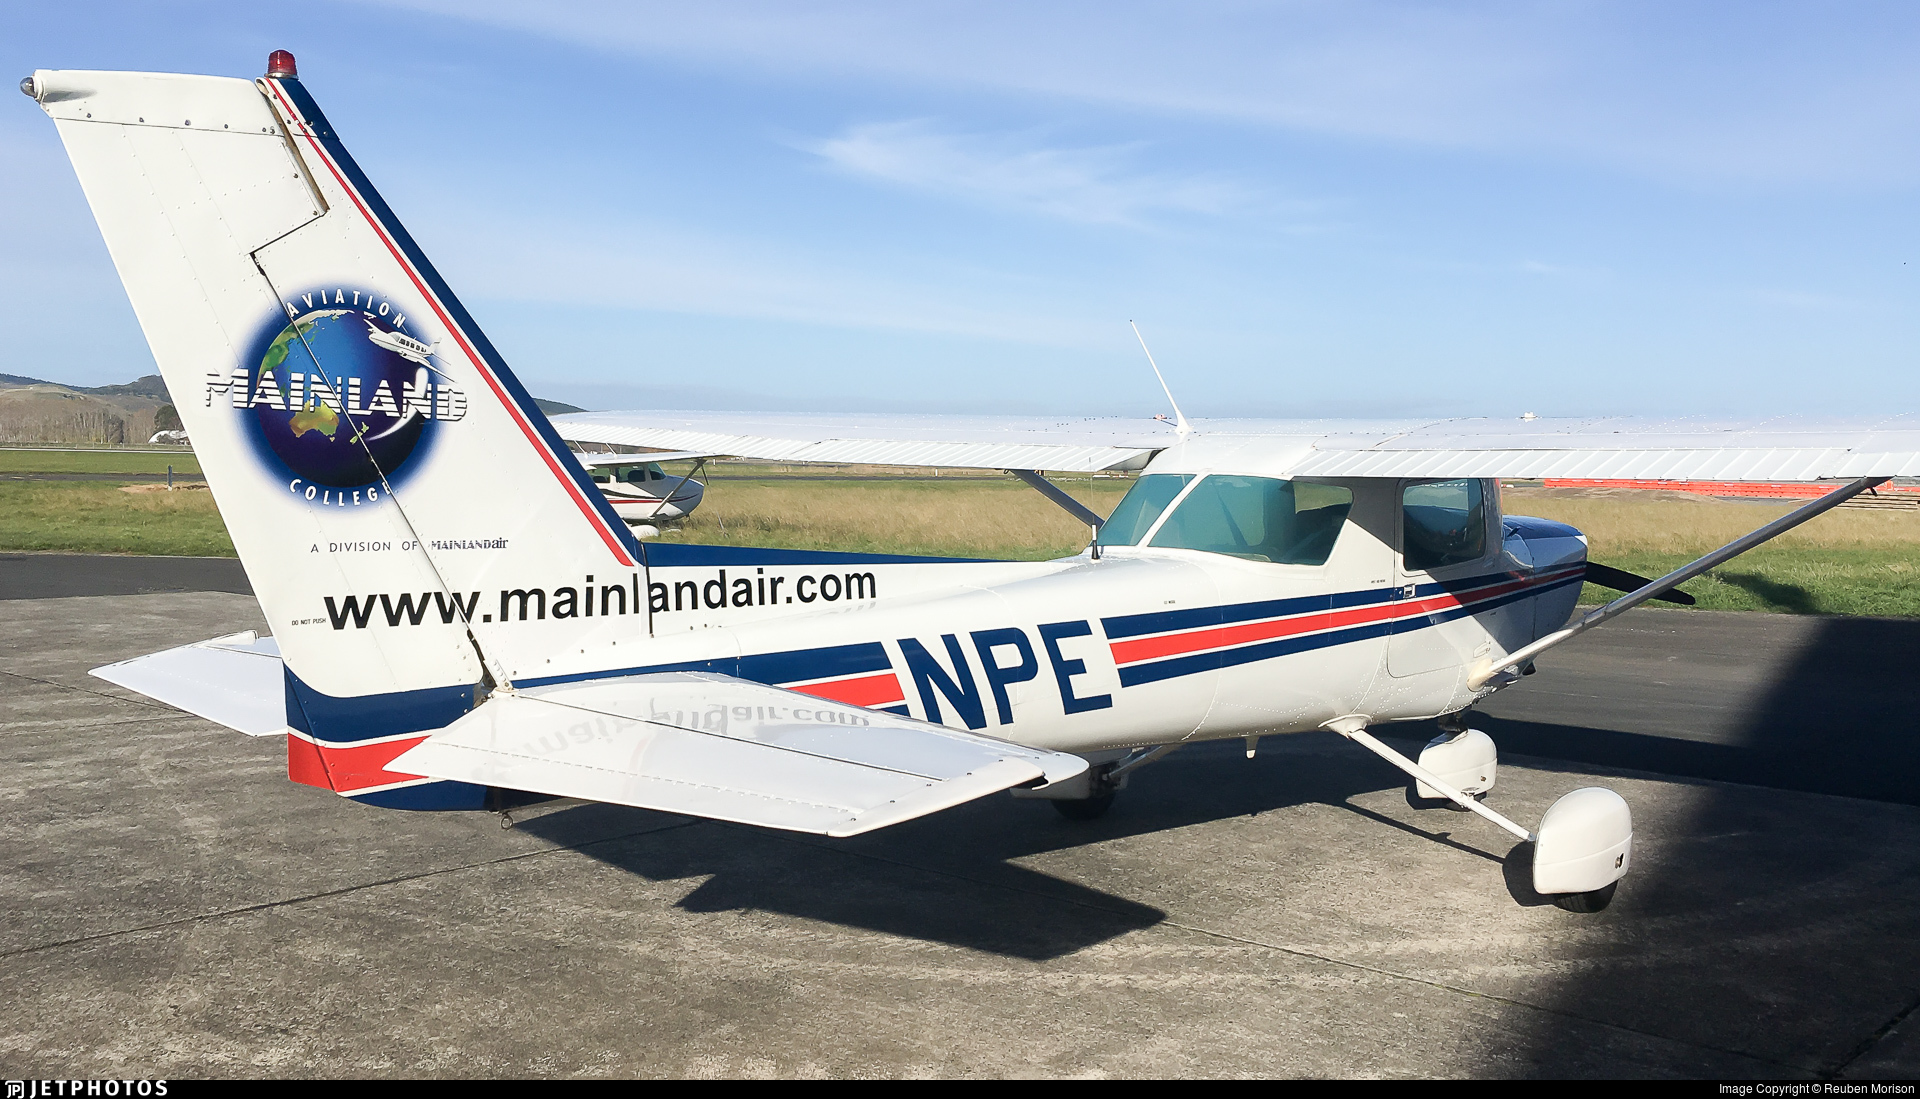 ZK-NPE - Cessna 152 - Mainland Air